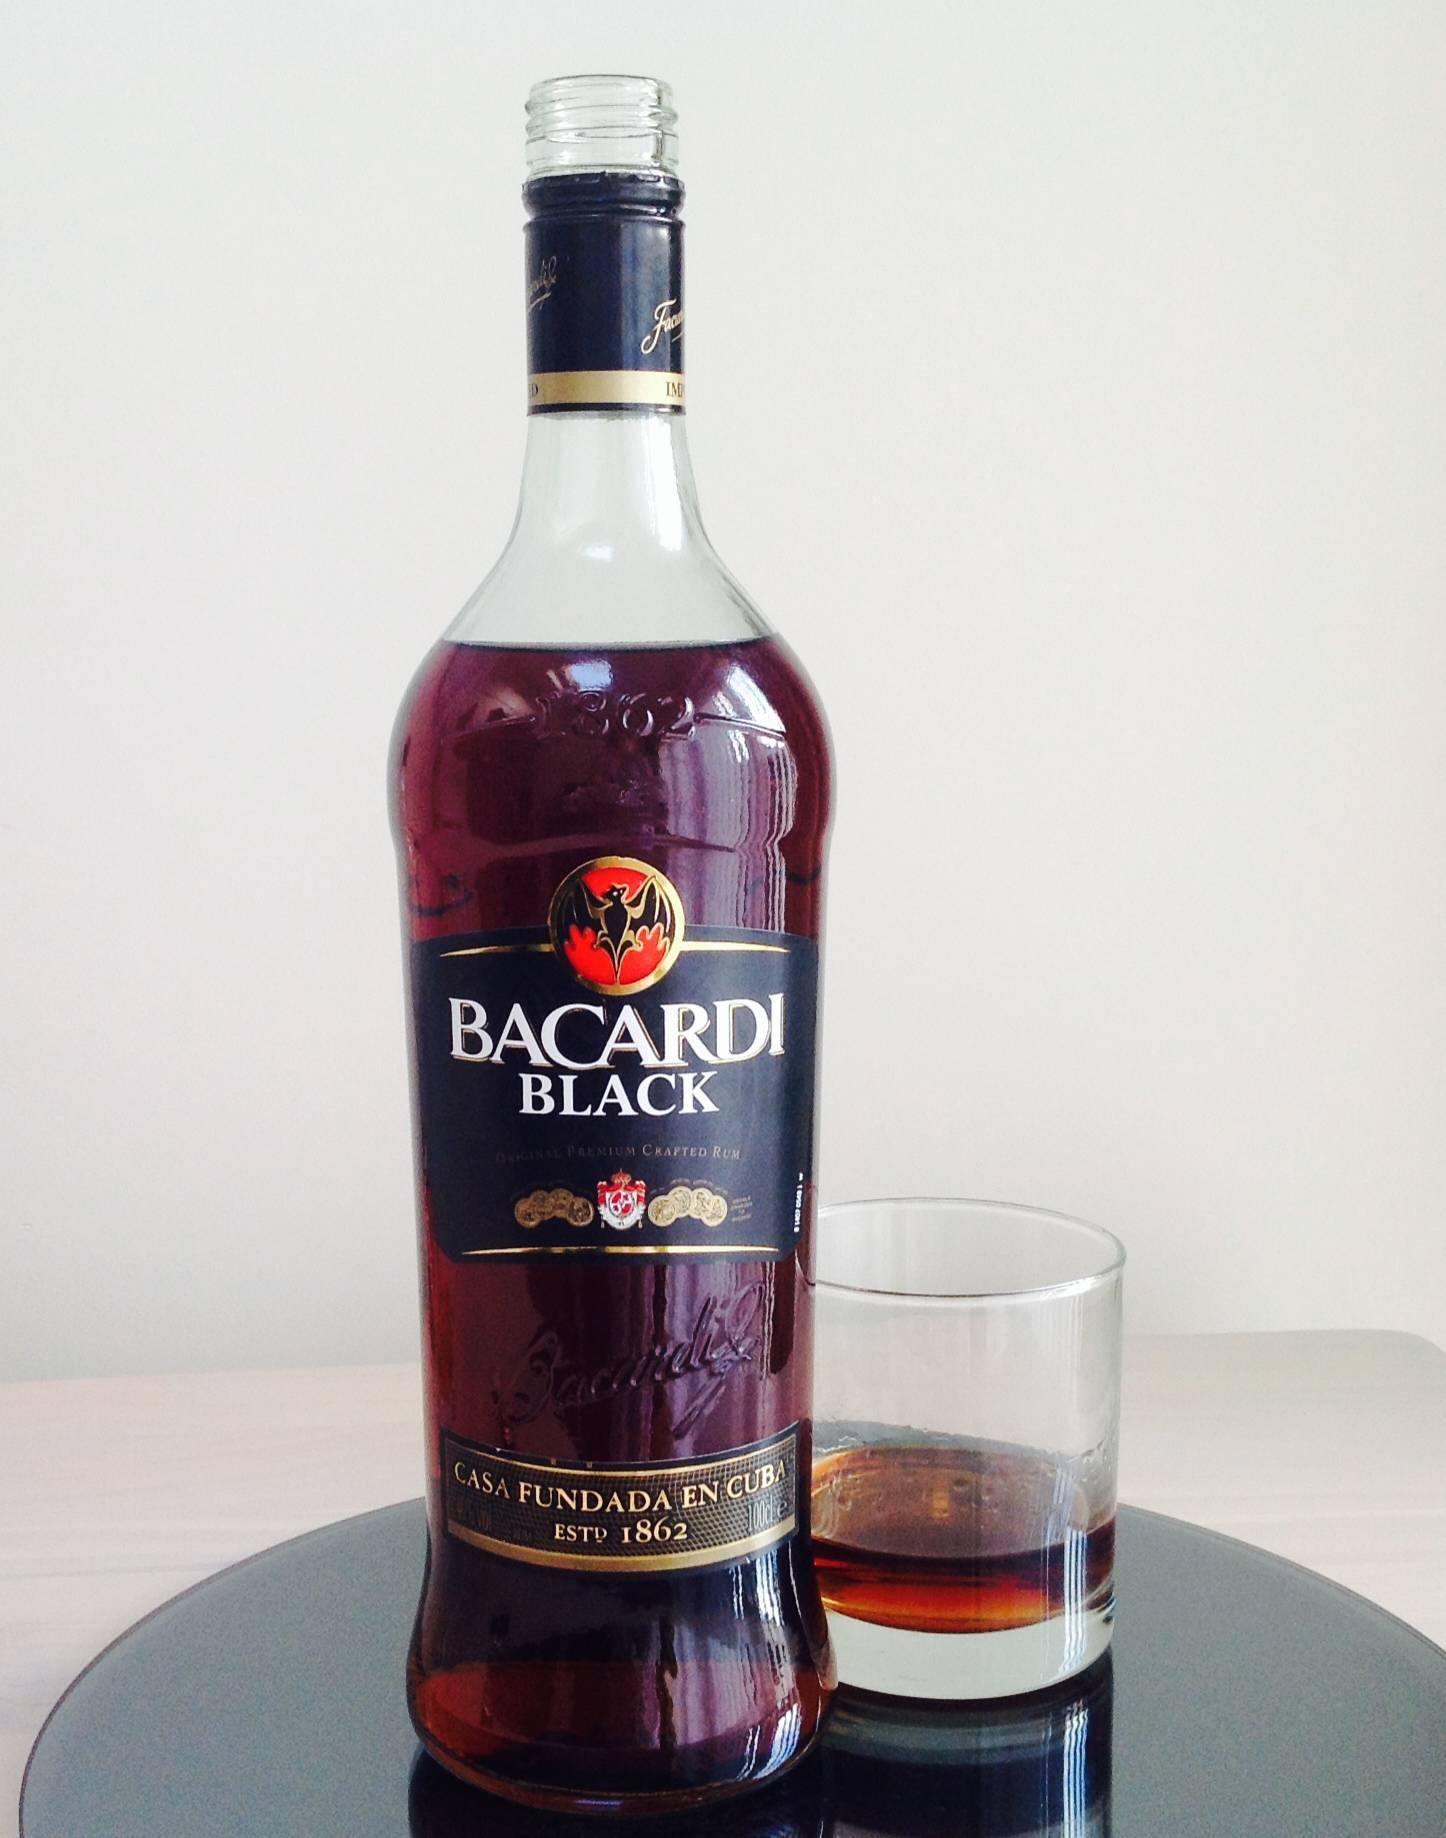 Ром бакарди (bacardi) — история появления и характеристика напитка